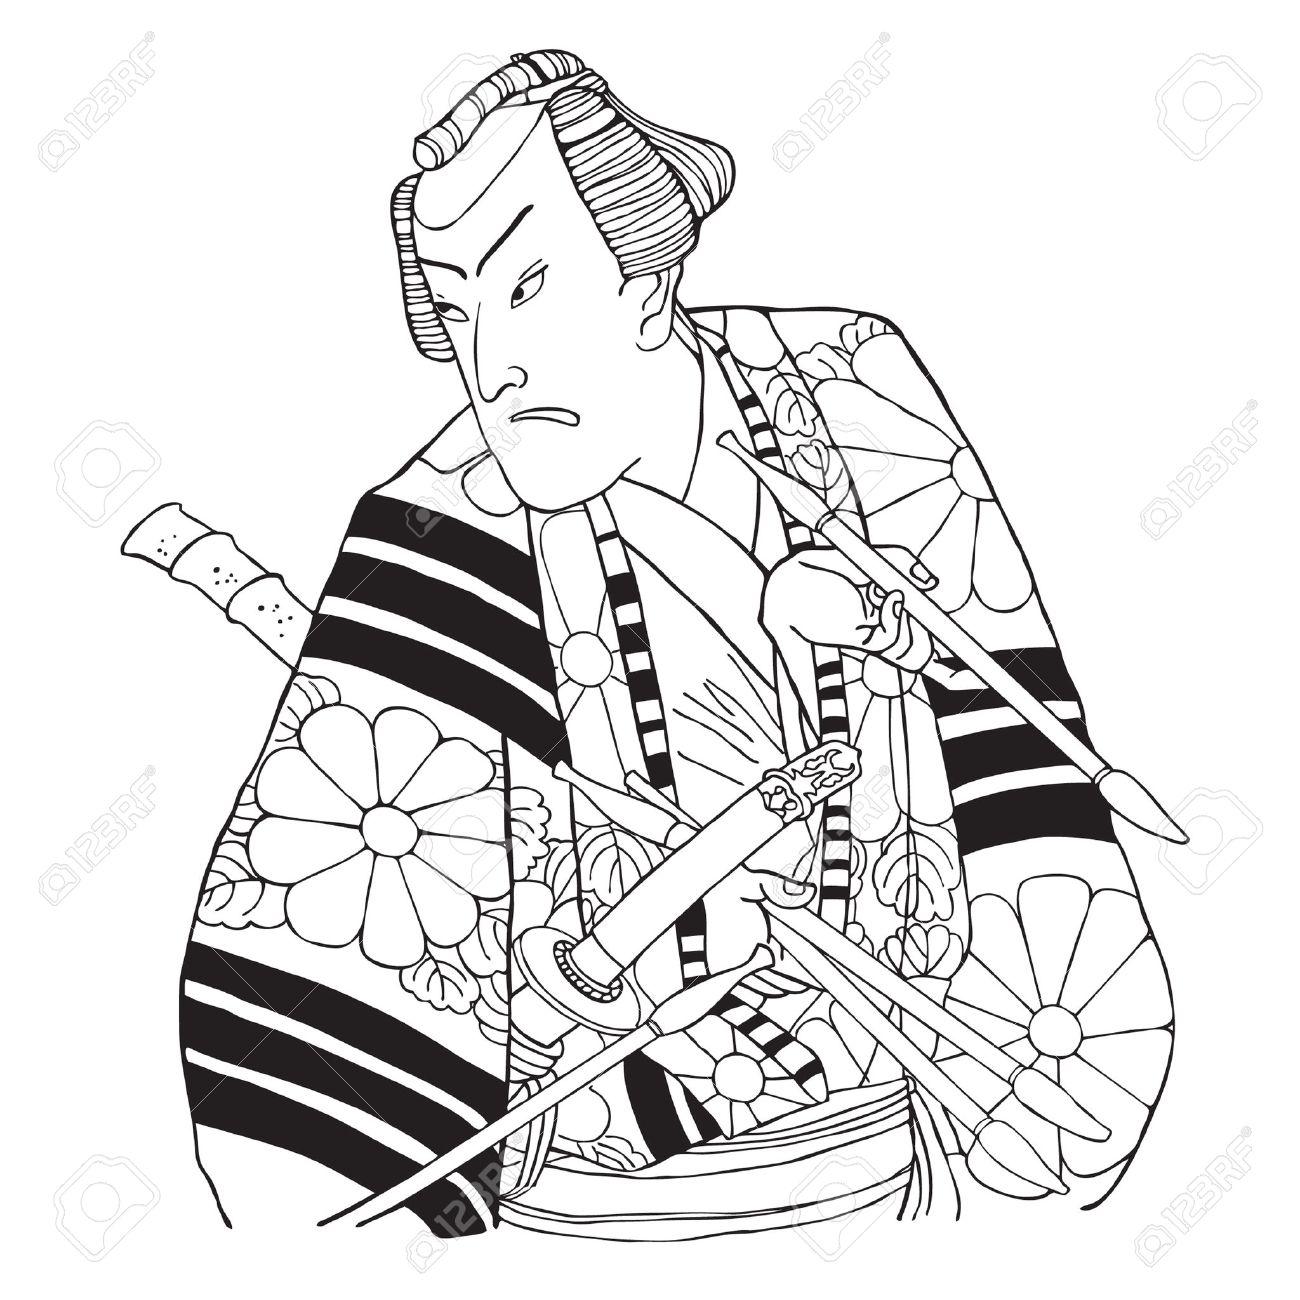 1300x1300 Japanese Samurai. Illustration Royalty Free Cliparts, Vectors,